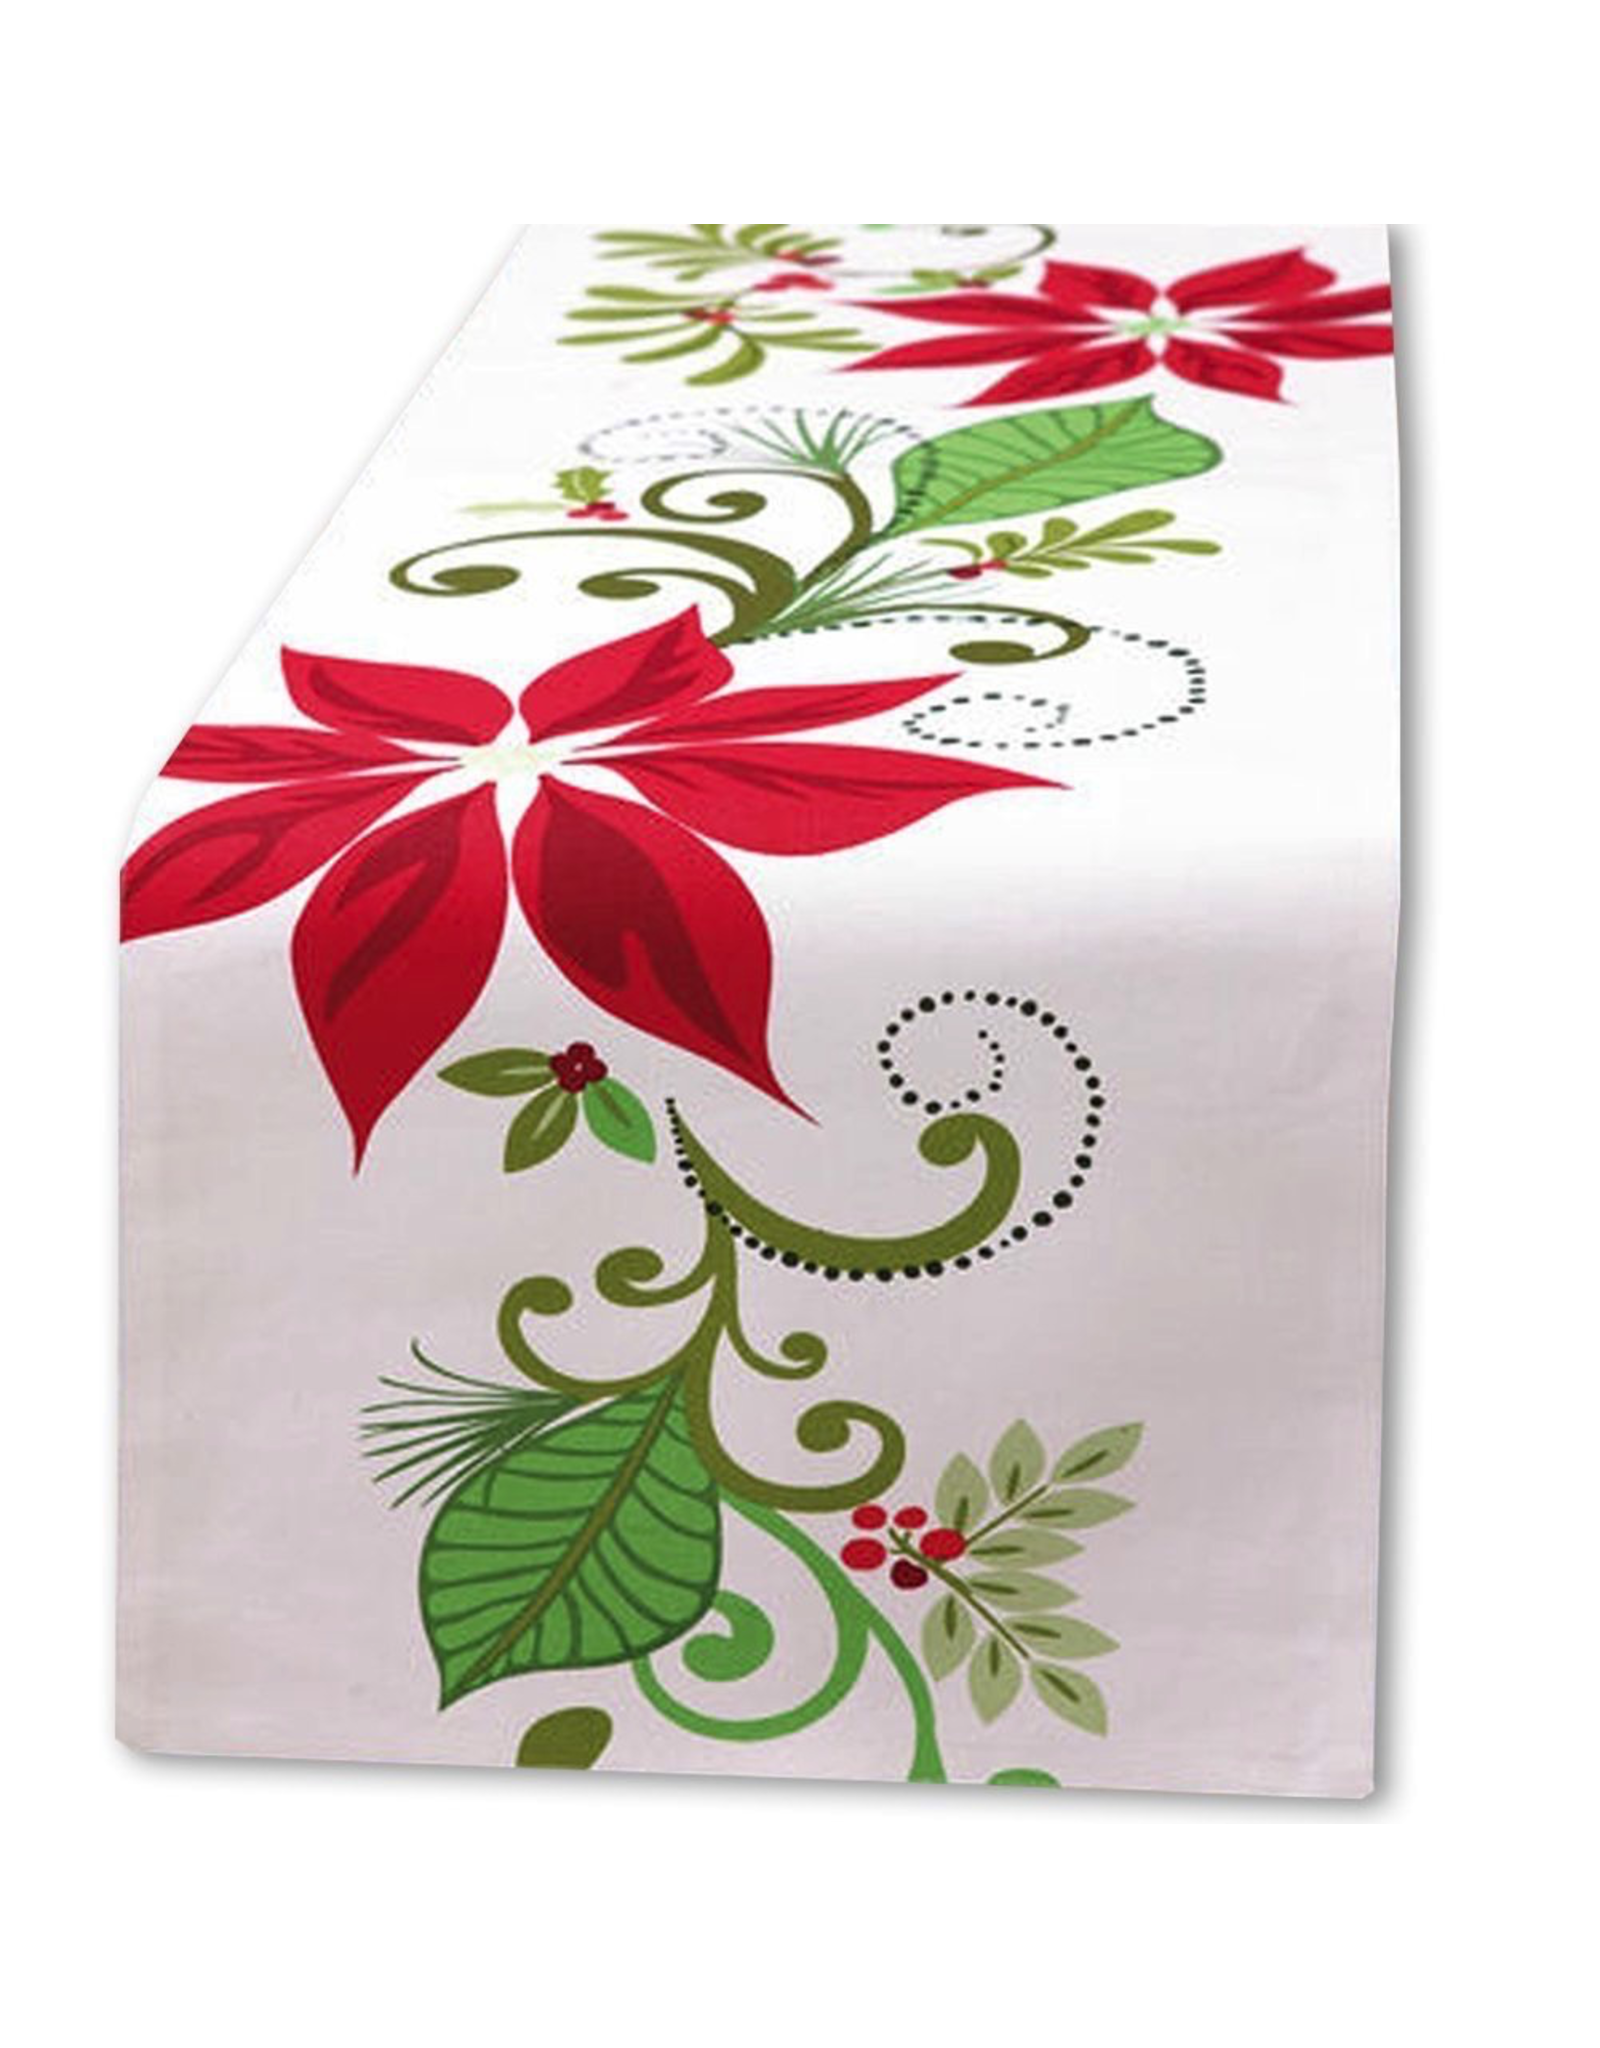 Peking Handicraft Christmas Table Runner 72l Poinsettia By Kate Spain Digs N Gifts